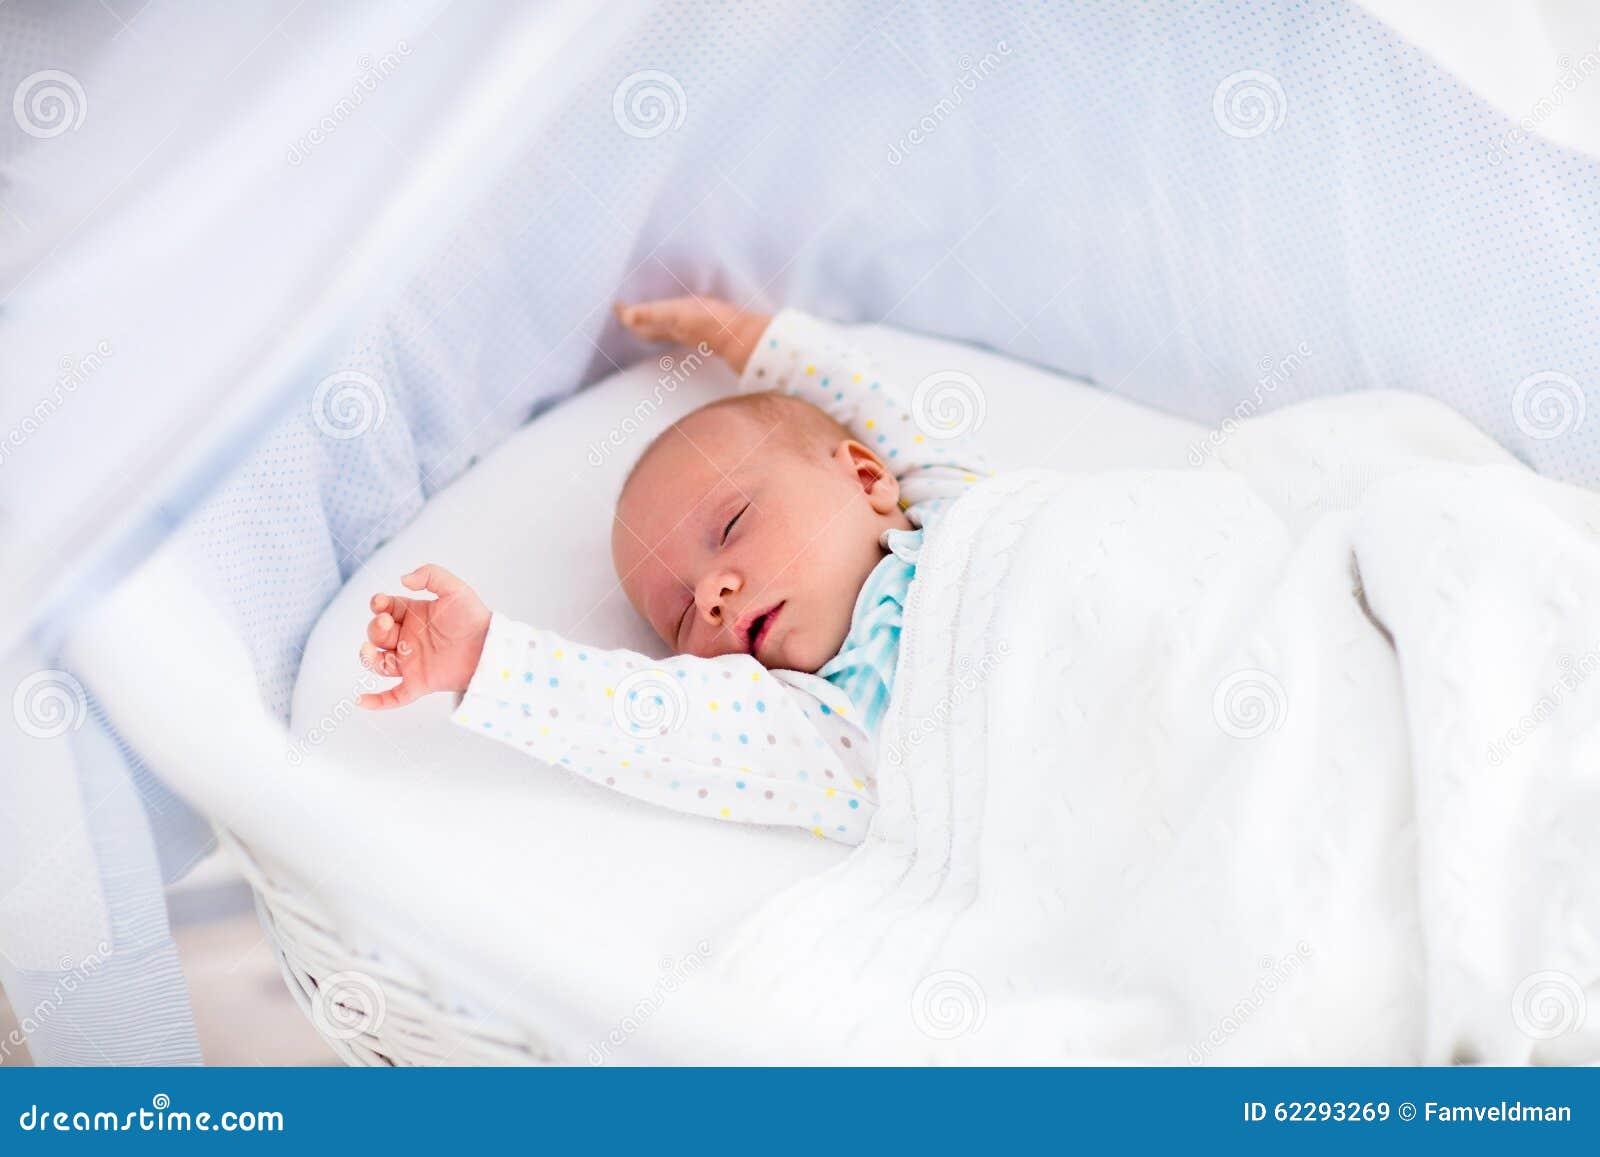 Cute Newborn Baby In White Bed Stock Image Image Of Blanket Nursery 62293269